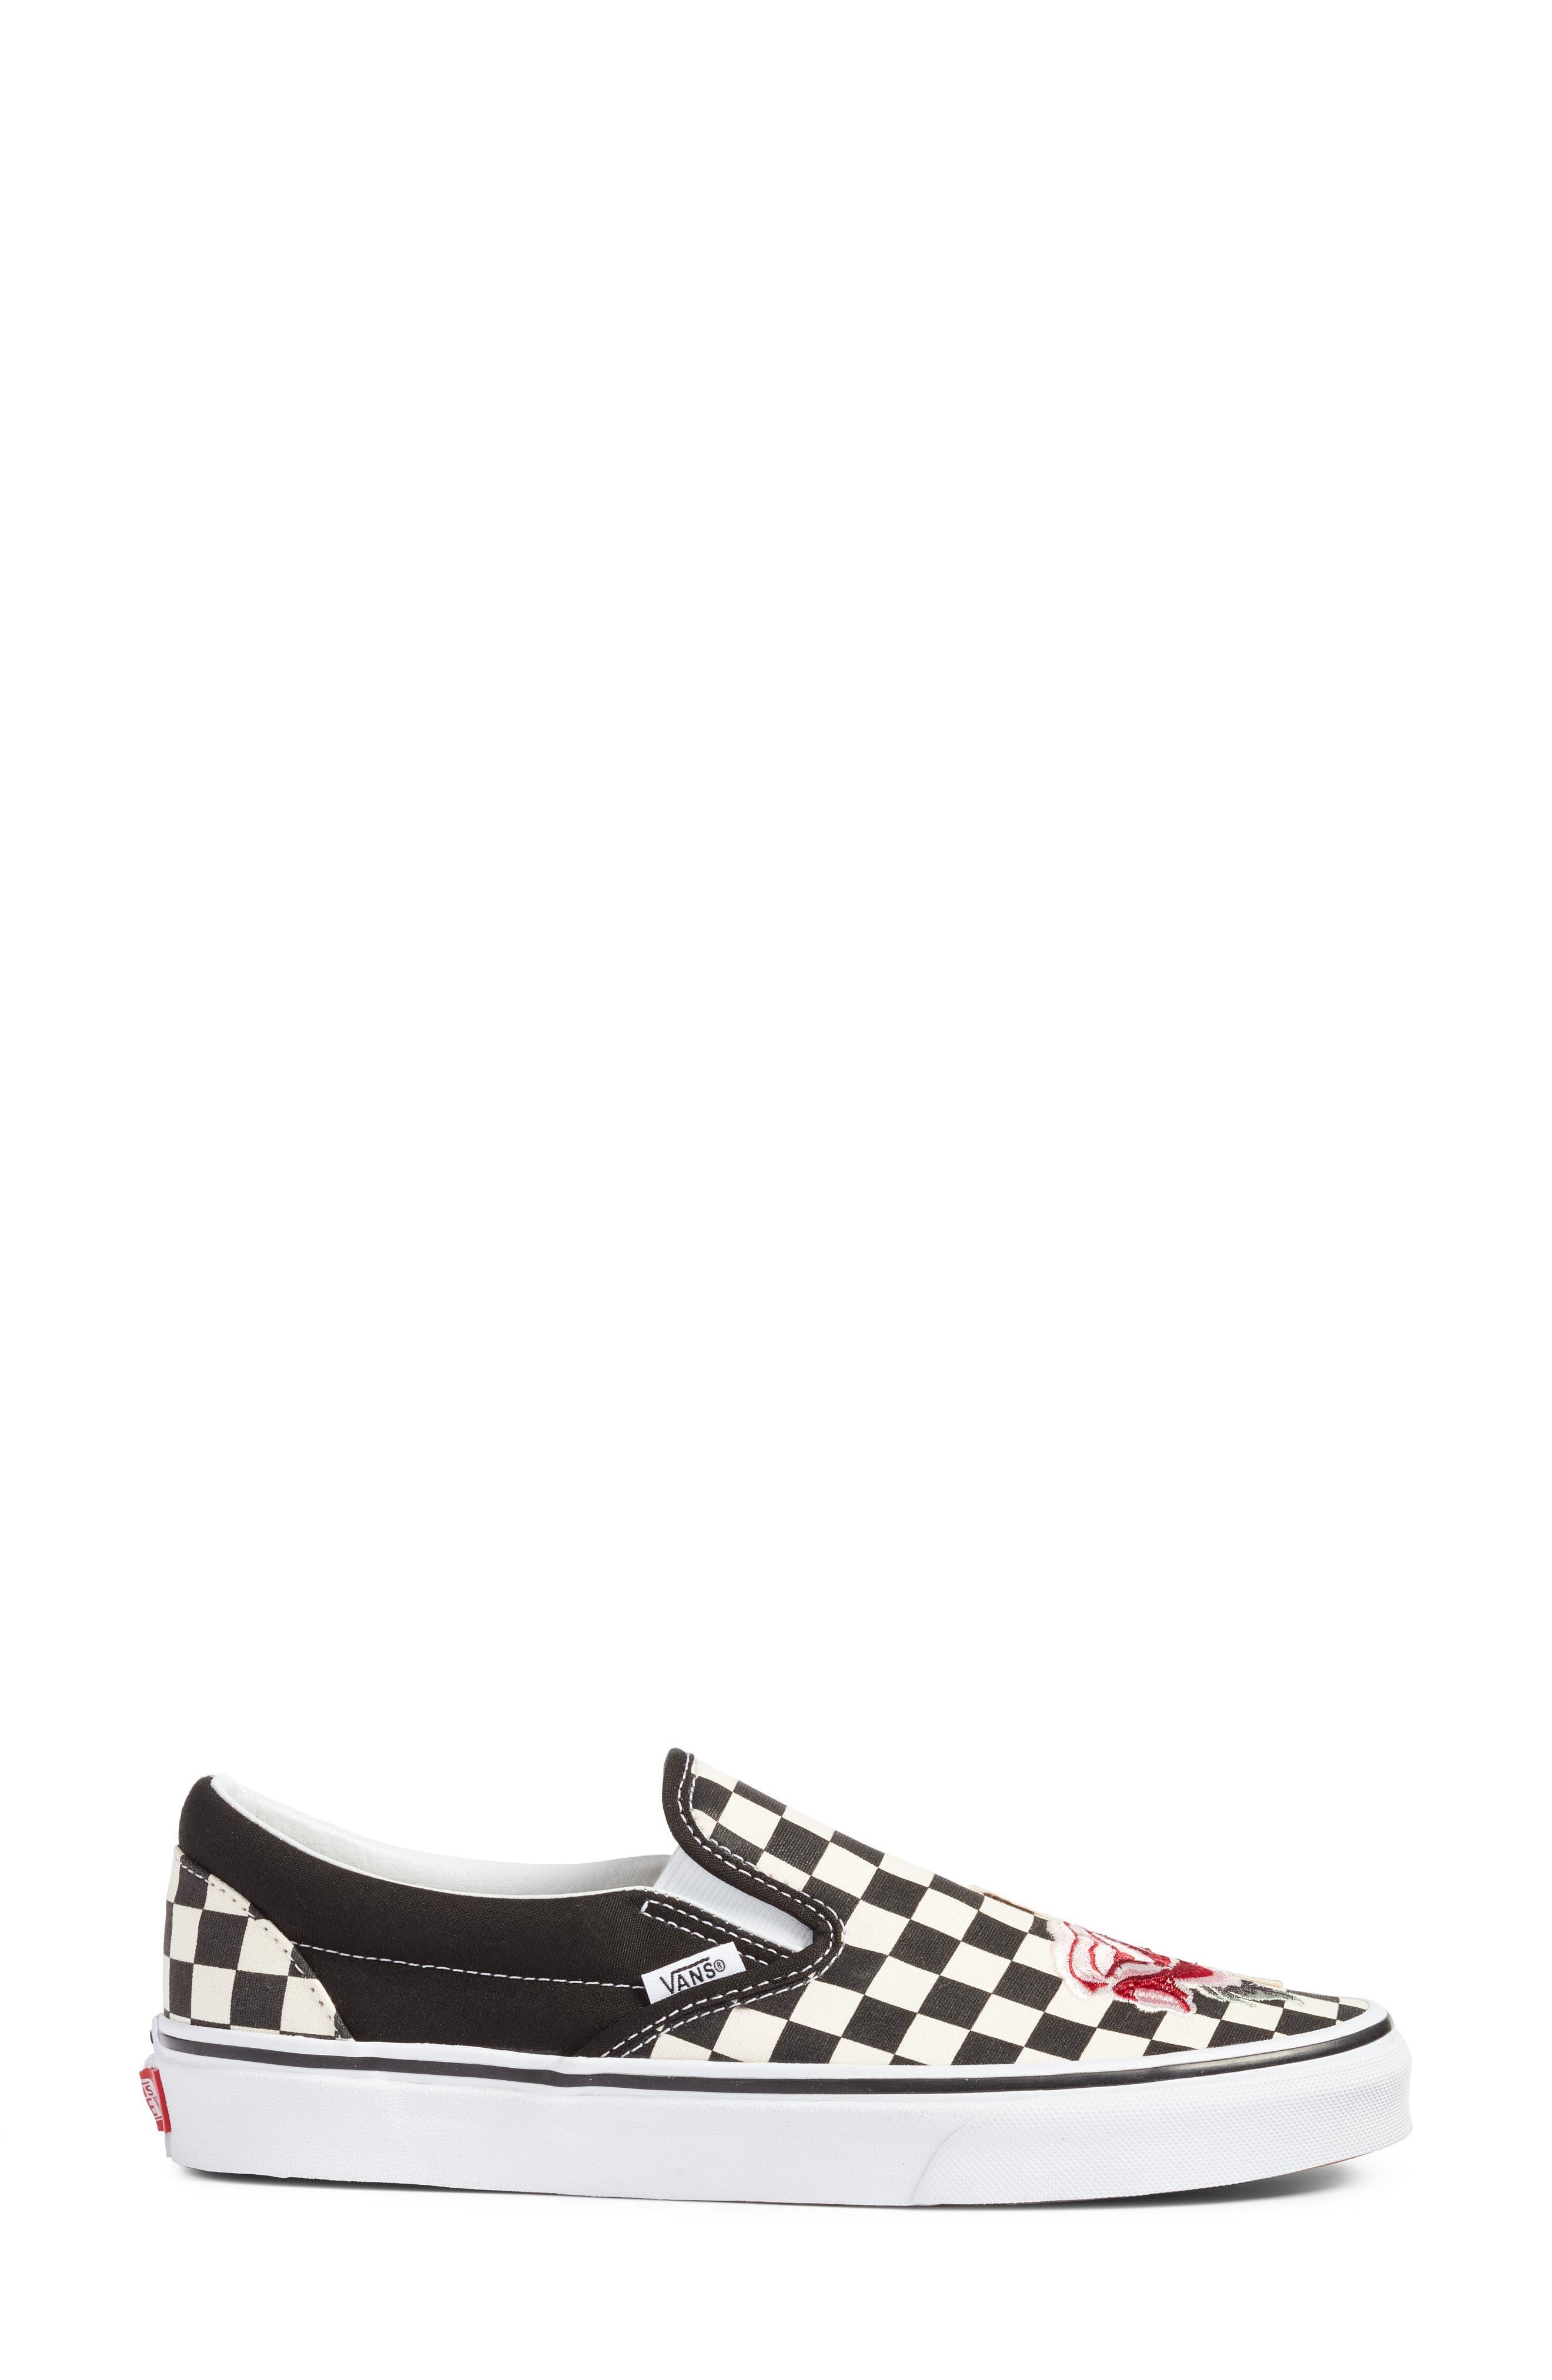 UA Classic Slip-On Sneaker,                             Alternate thumbnail 3, color,                             001